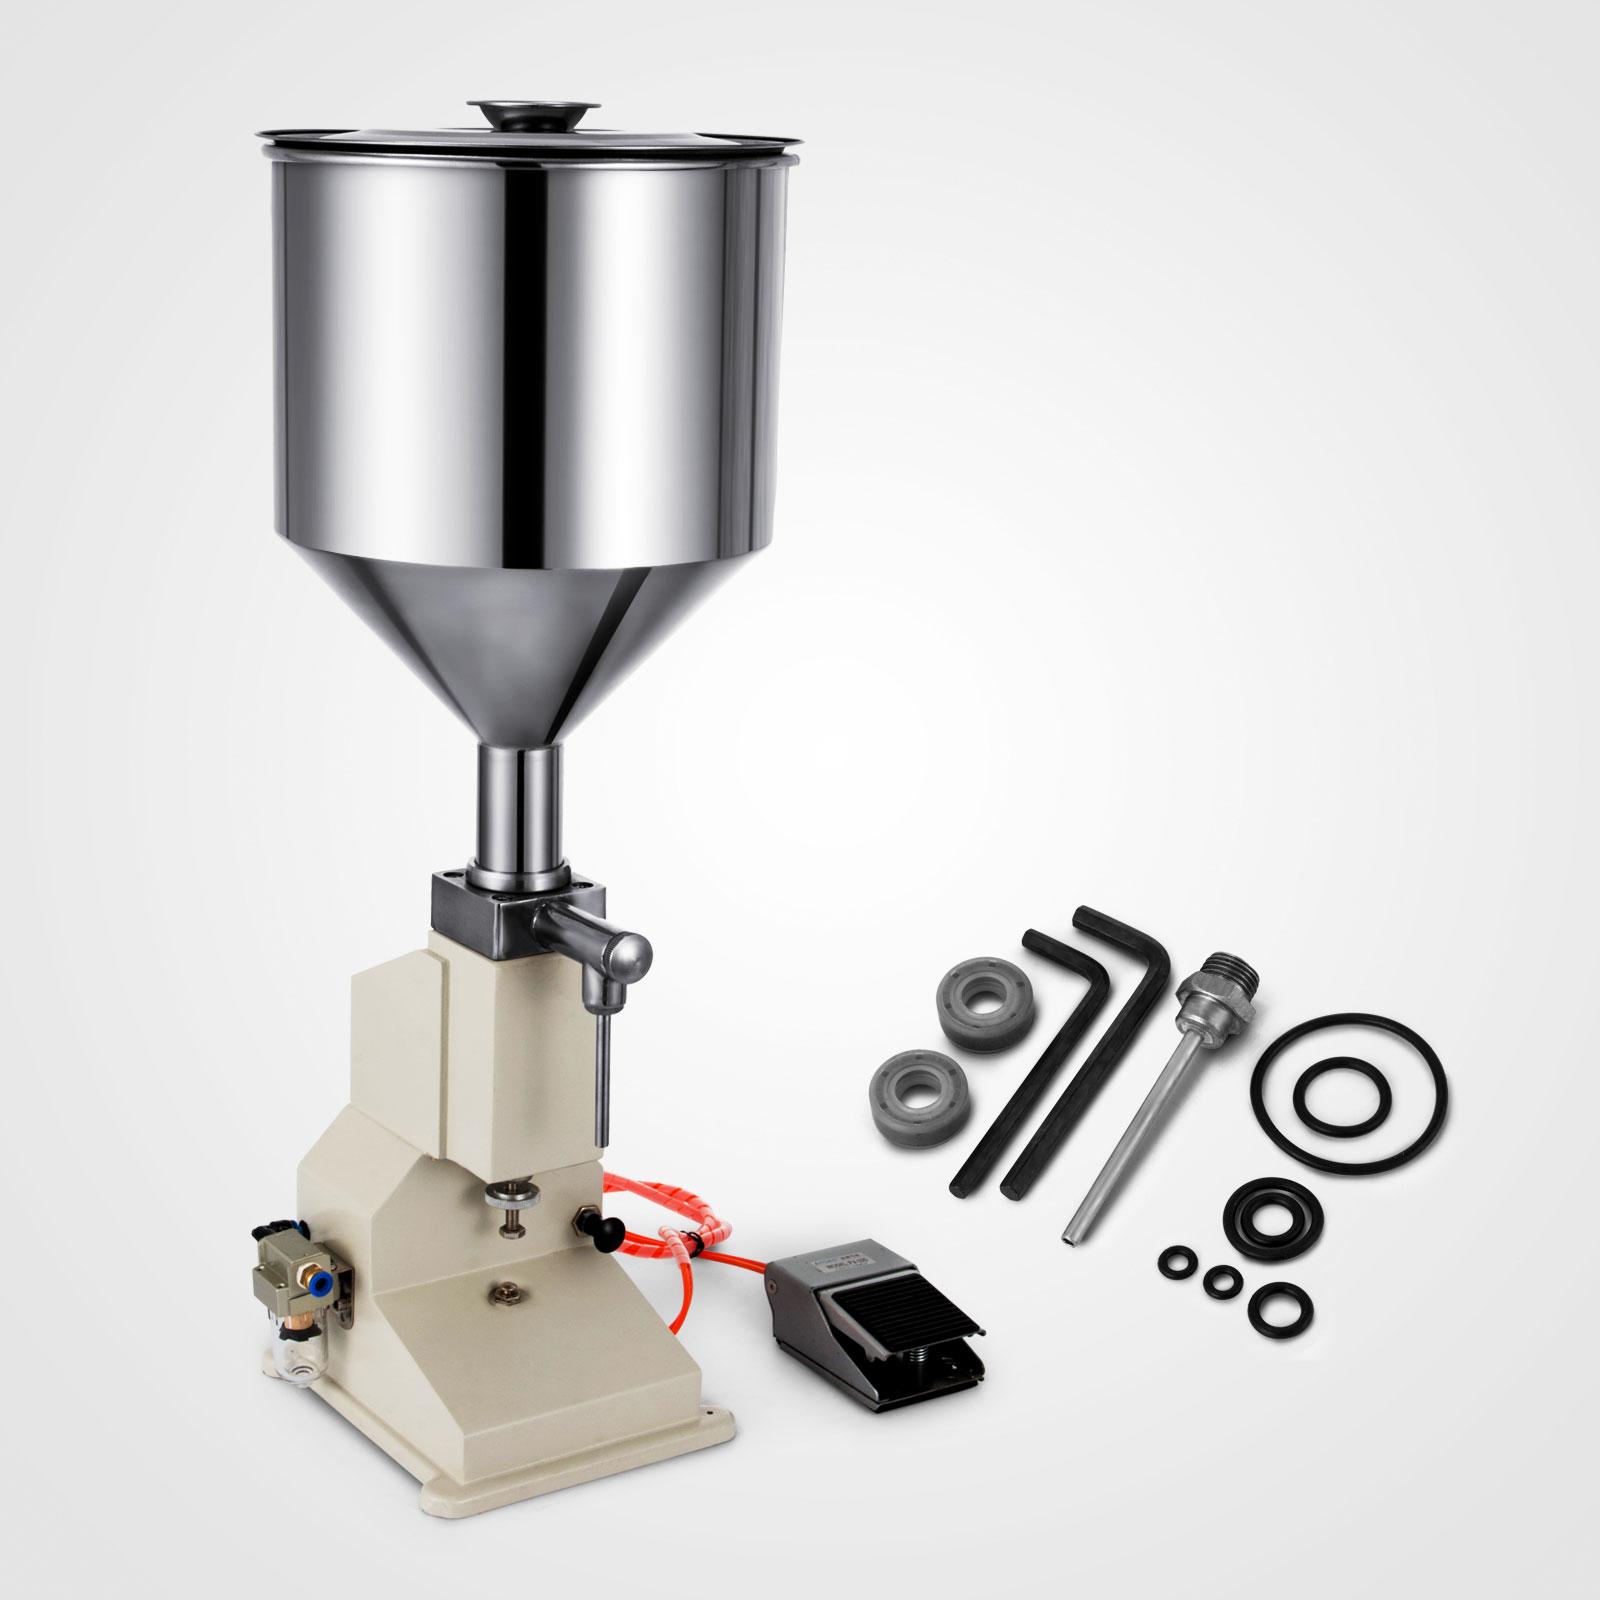 Liquid-Filling-Machine-Filler-Remplissage-2-3500ML-50-500ML-INDUSTRY-SUPPLY miniature 52